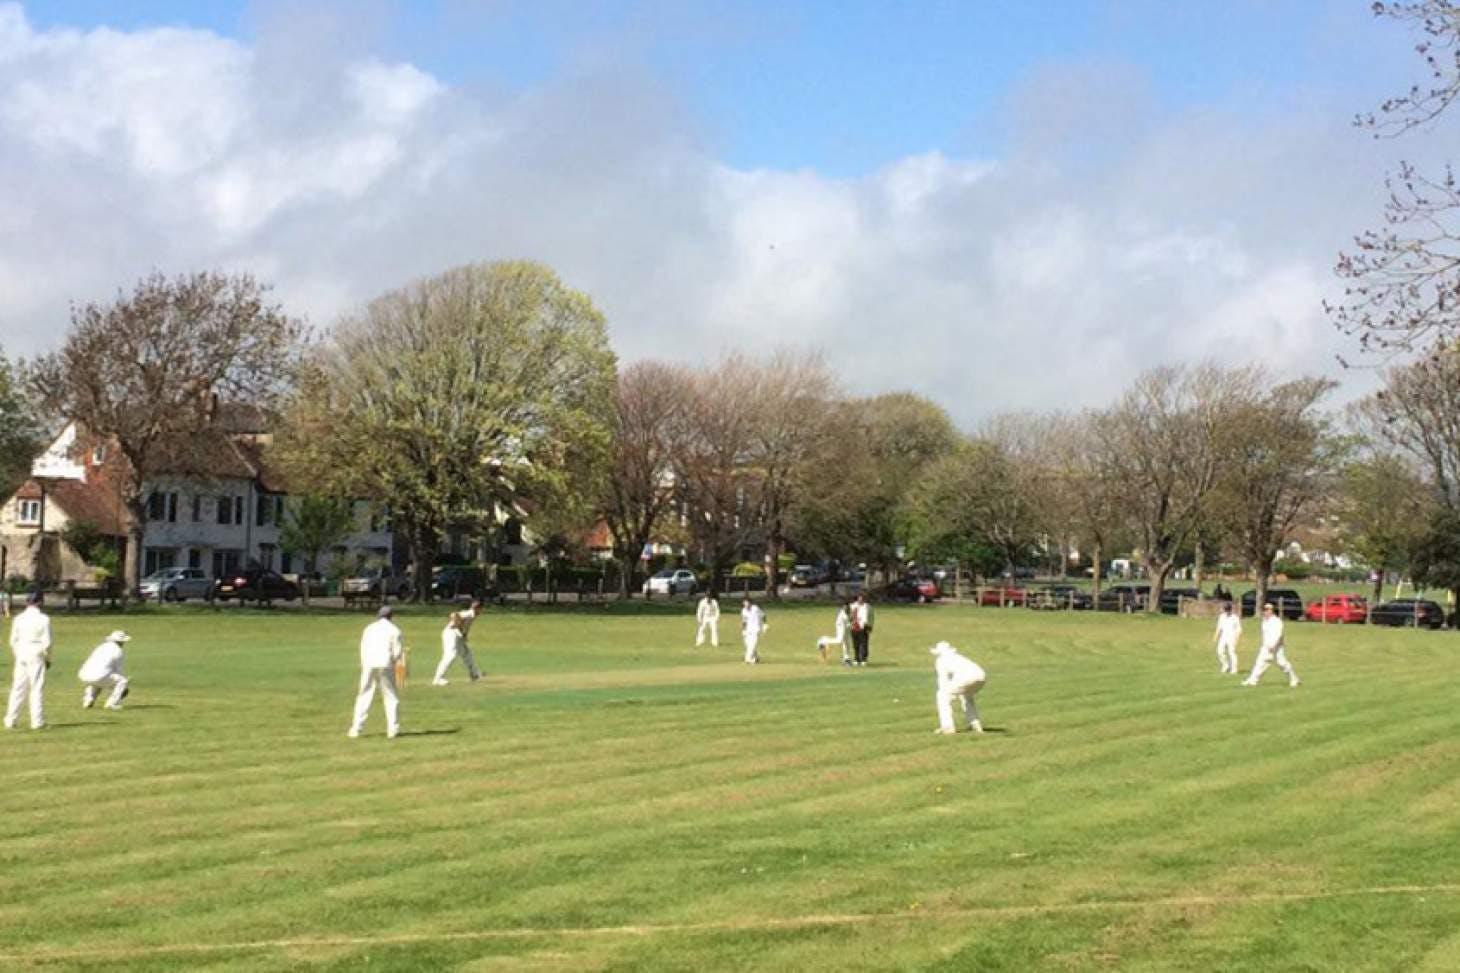 Southwick Green Full size   Grass cricket facilities